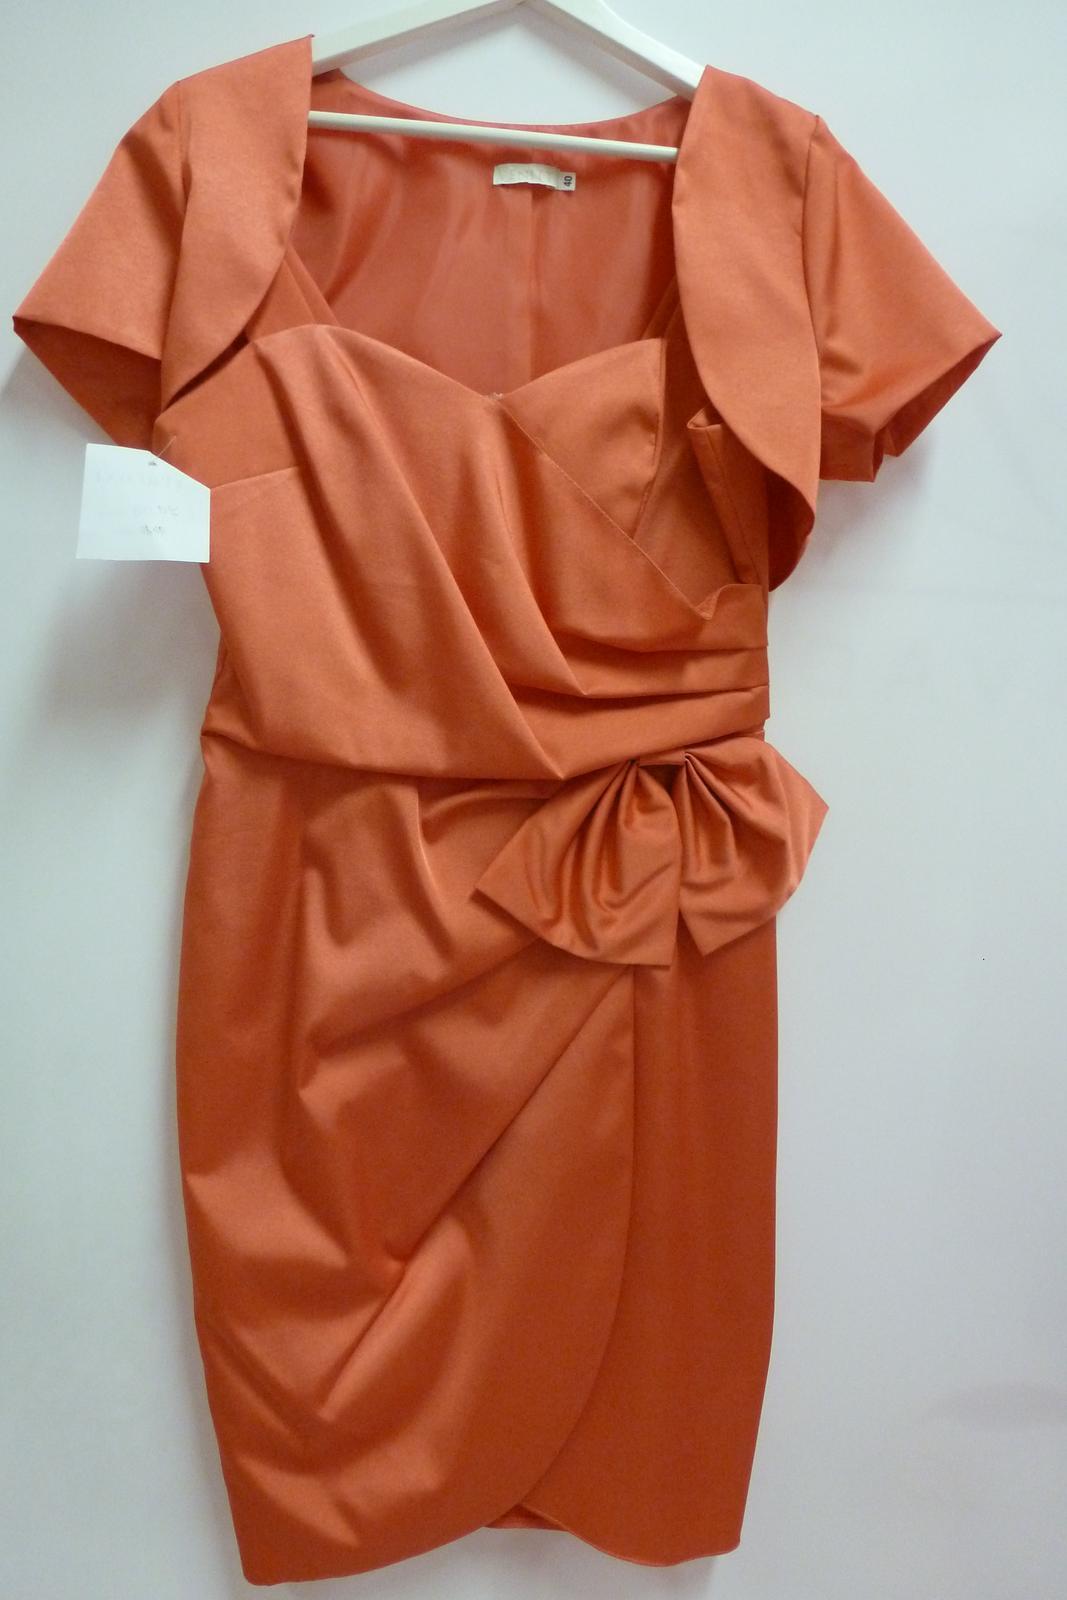 Spoločenské krátke šaty Veniti - Obrázok č. 1